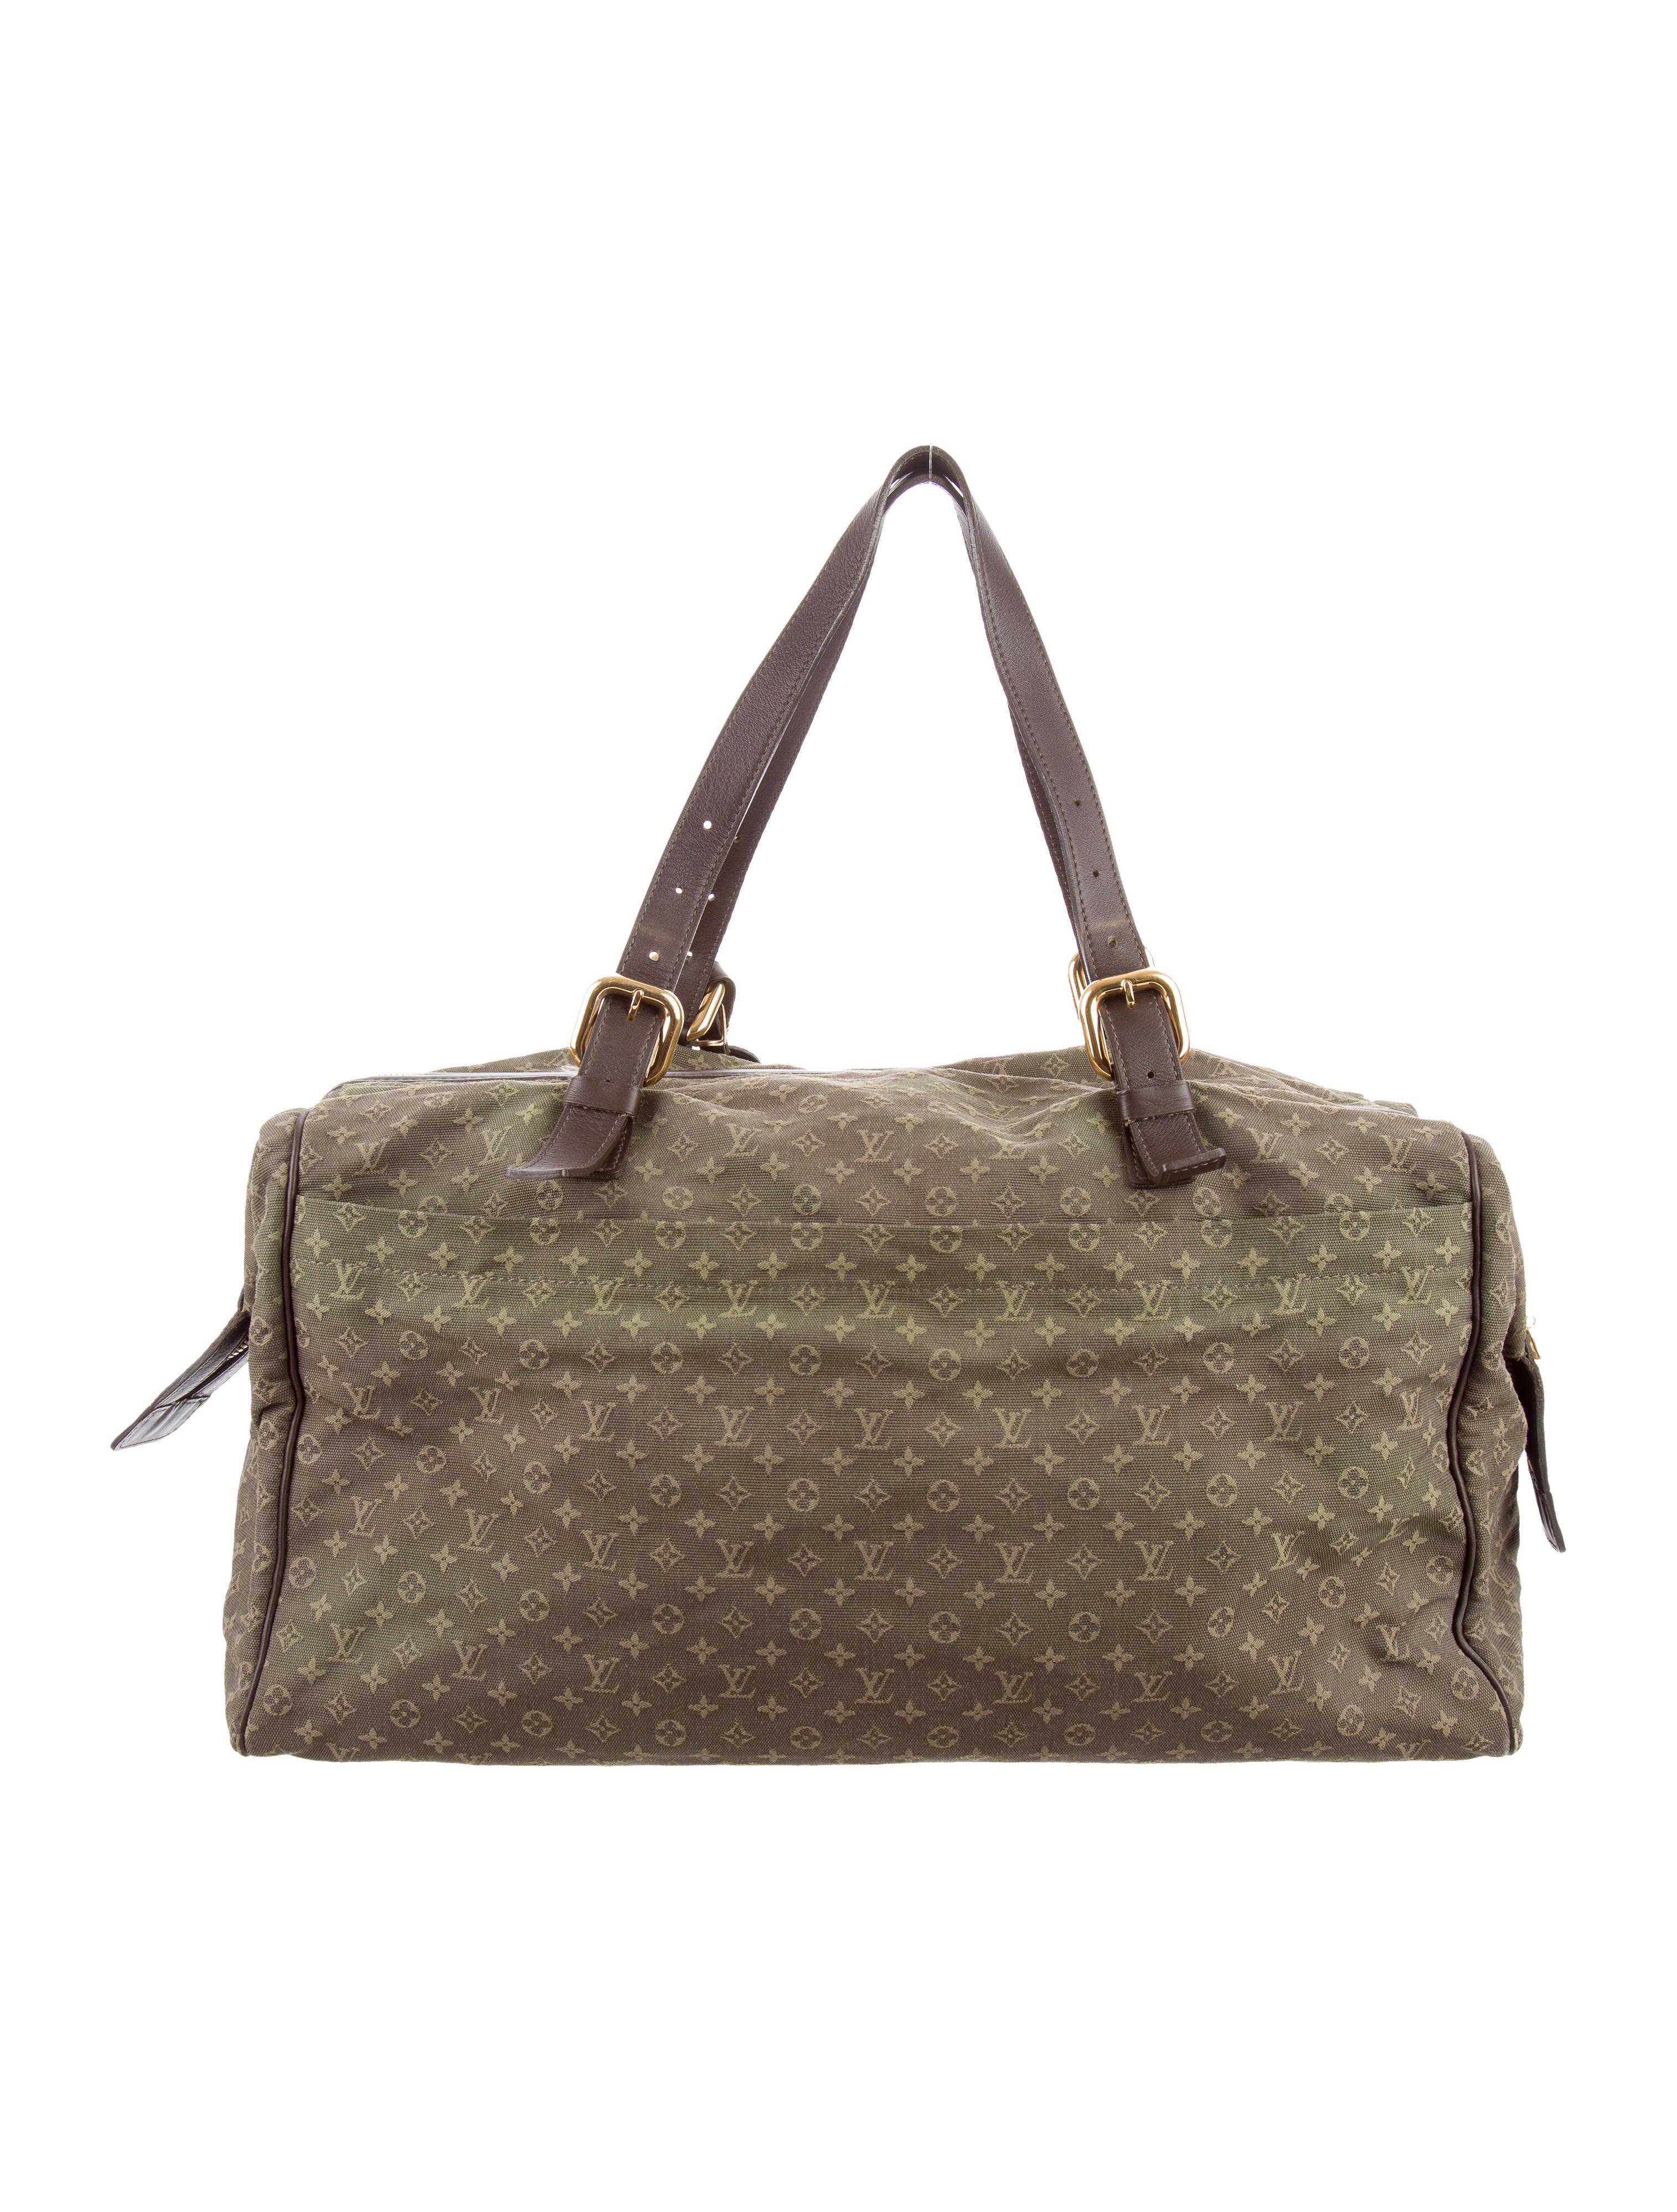 louis vuitton mini lin louise weekender bag handbags lou113589 the realreal. Black Bedroom Furniture Sets. Home Design Ideas